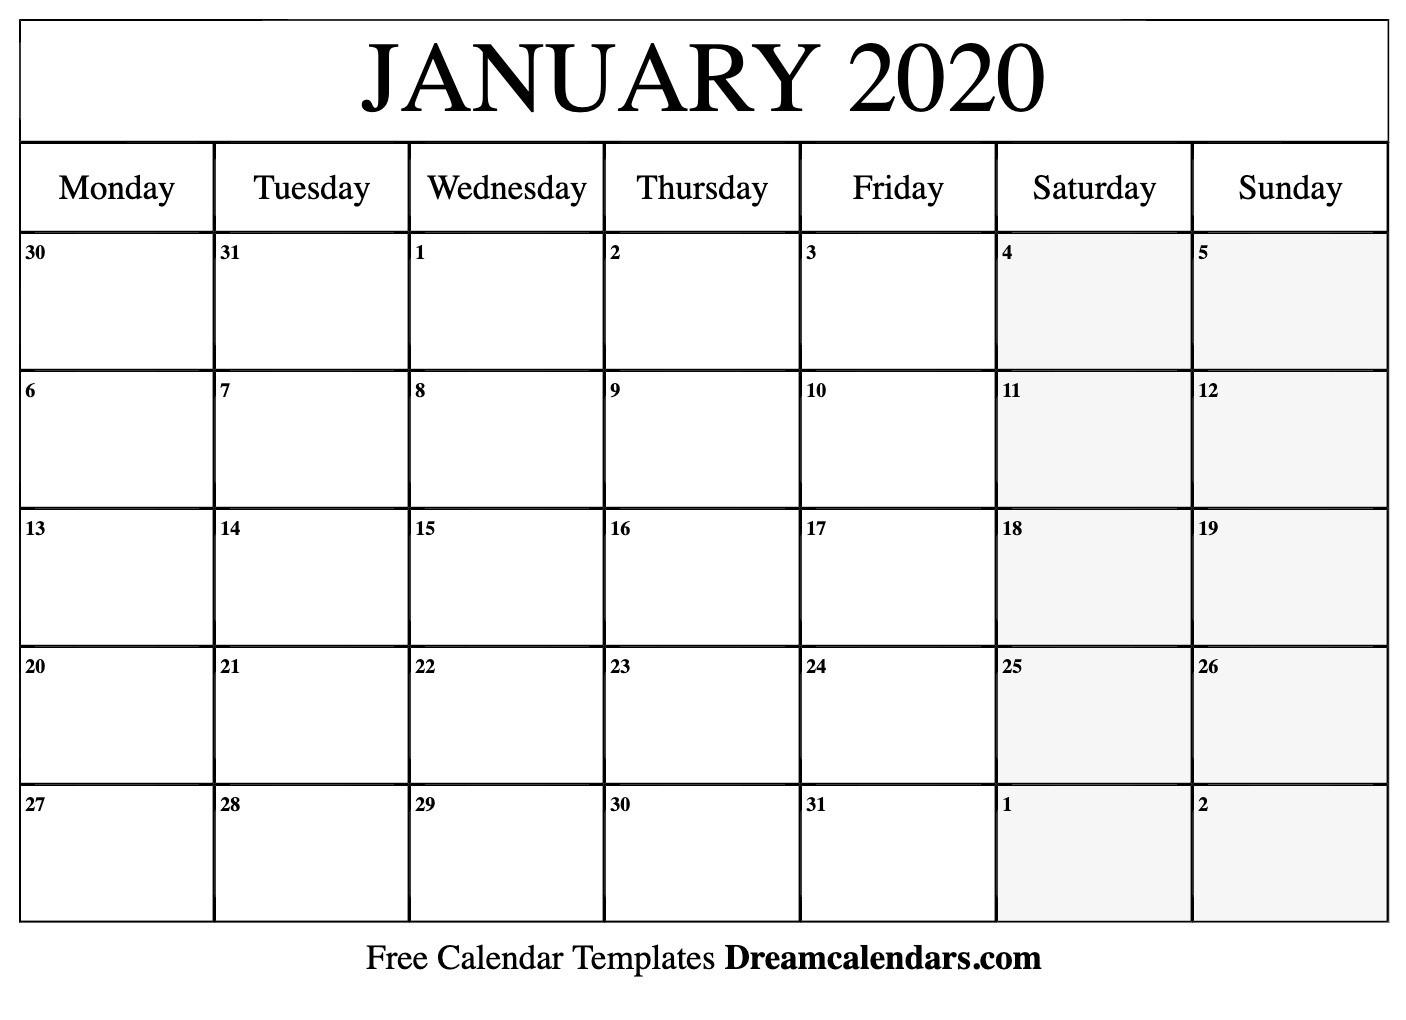 Printable January 2020 Calendar-January 2020 Calendar Printable